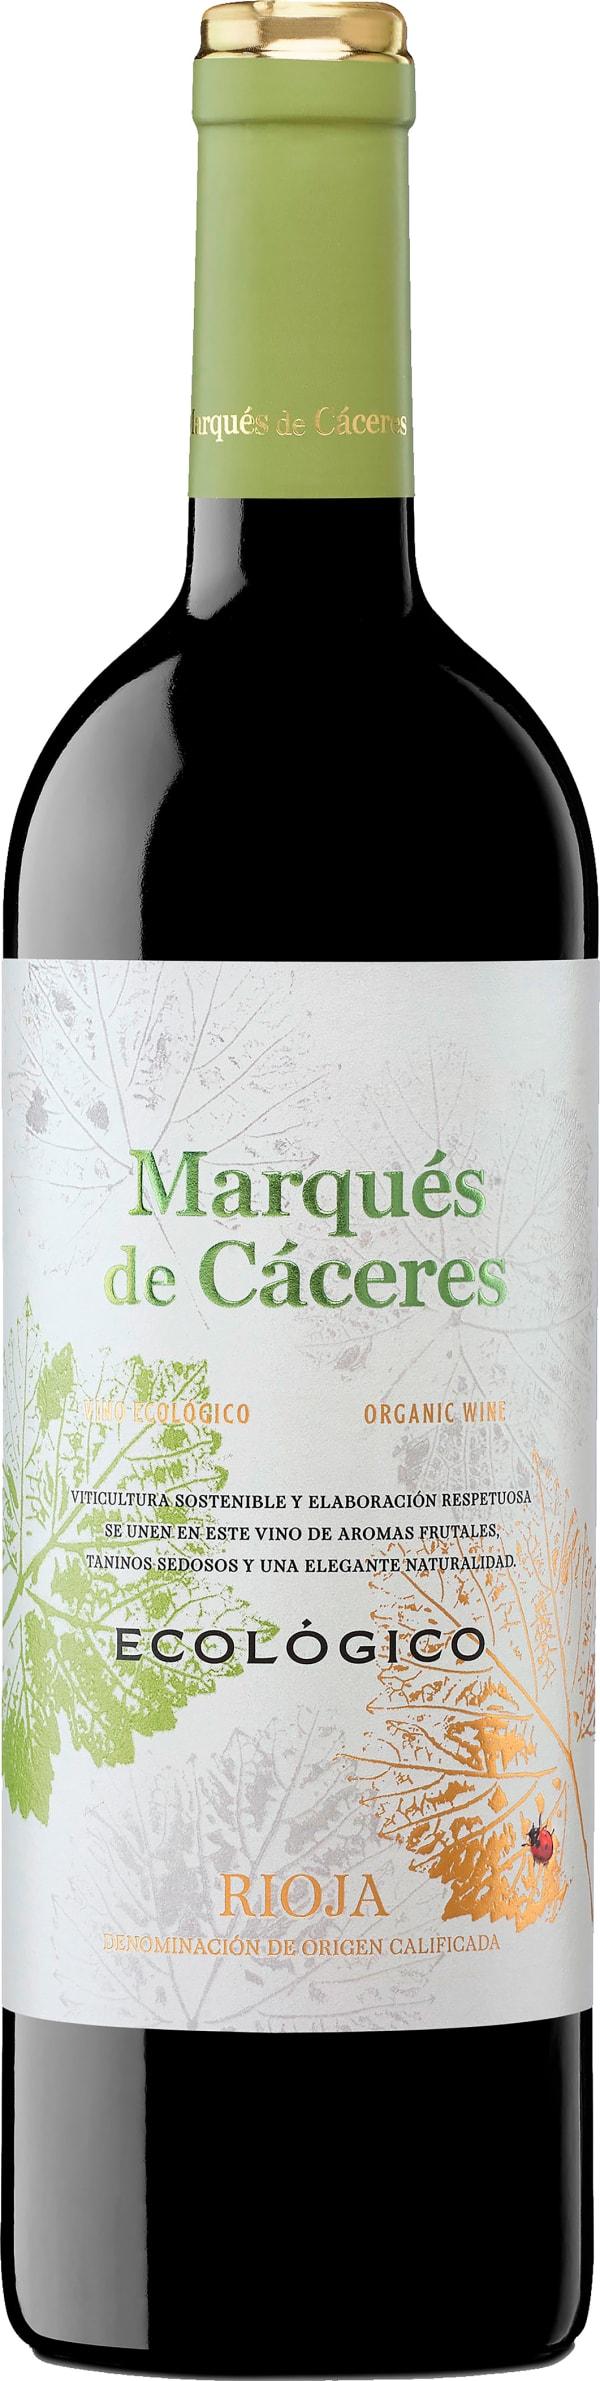 Marqués de Cáceres Vino Ecológico  2019